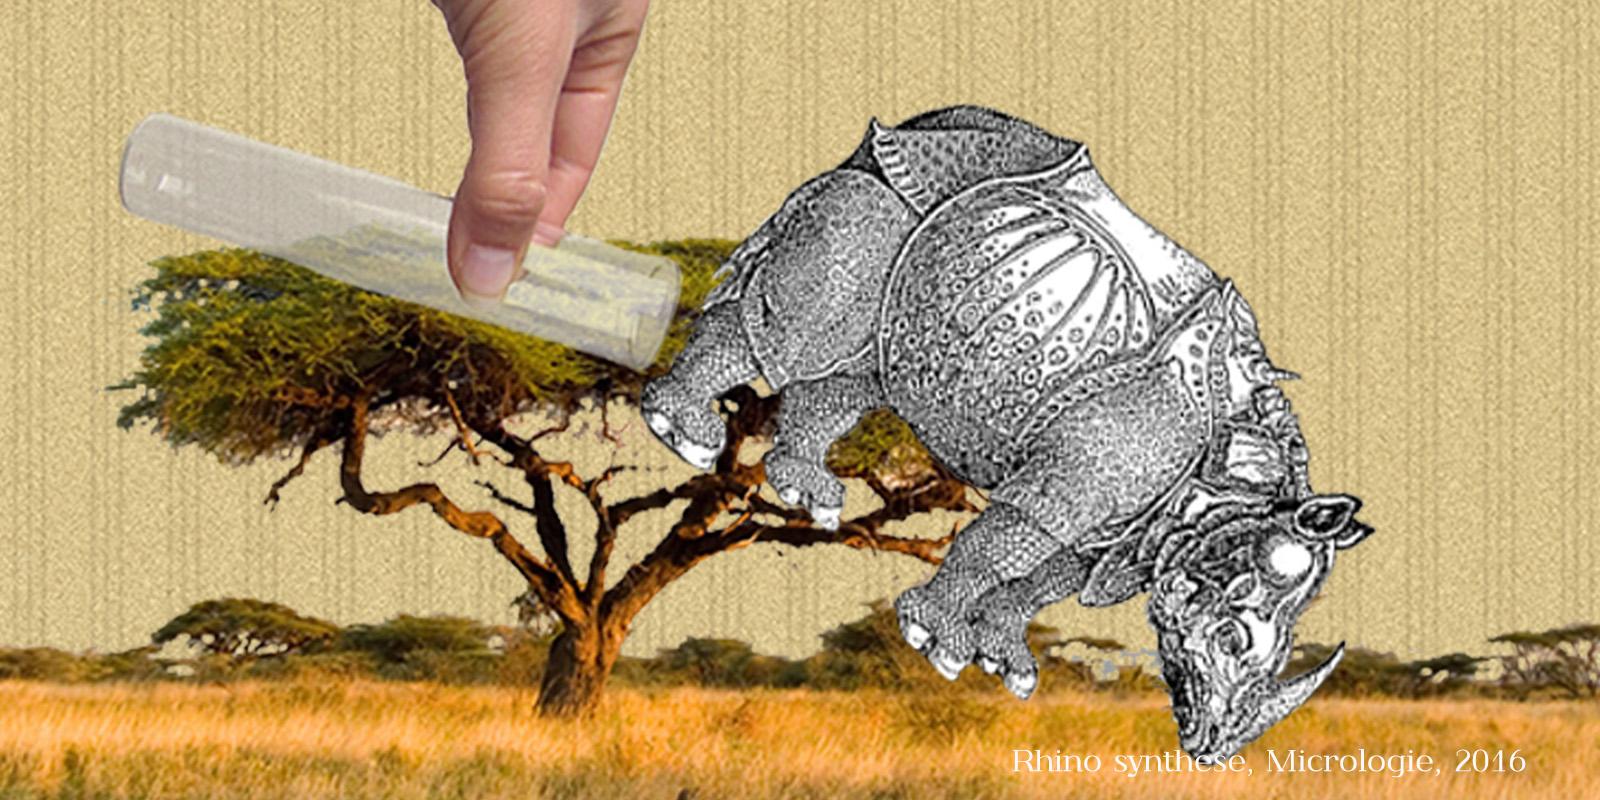 Rhinocéros de synthèse, micrologie